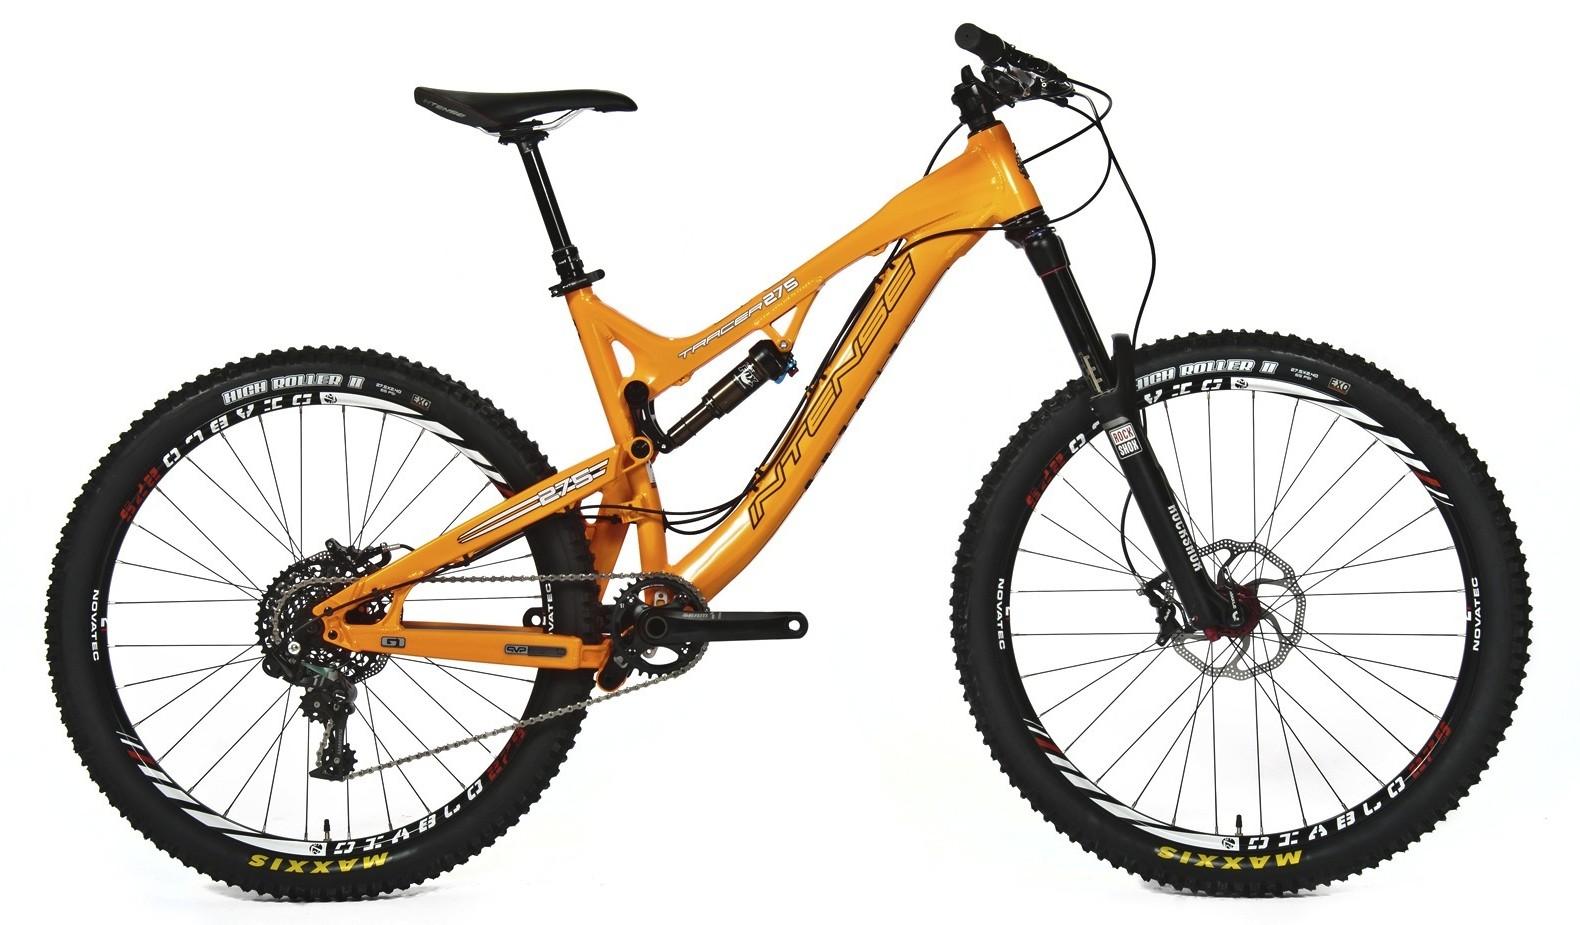 Bike - 2014 Intense Tracer 275 Pro